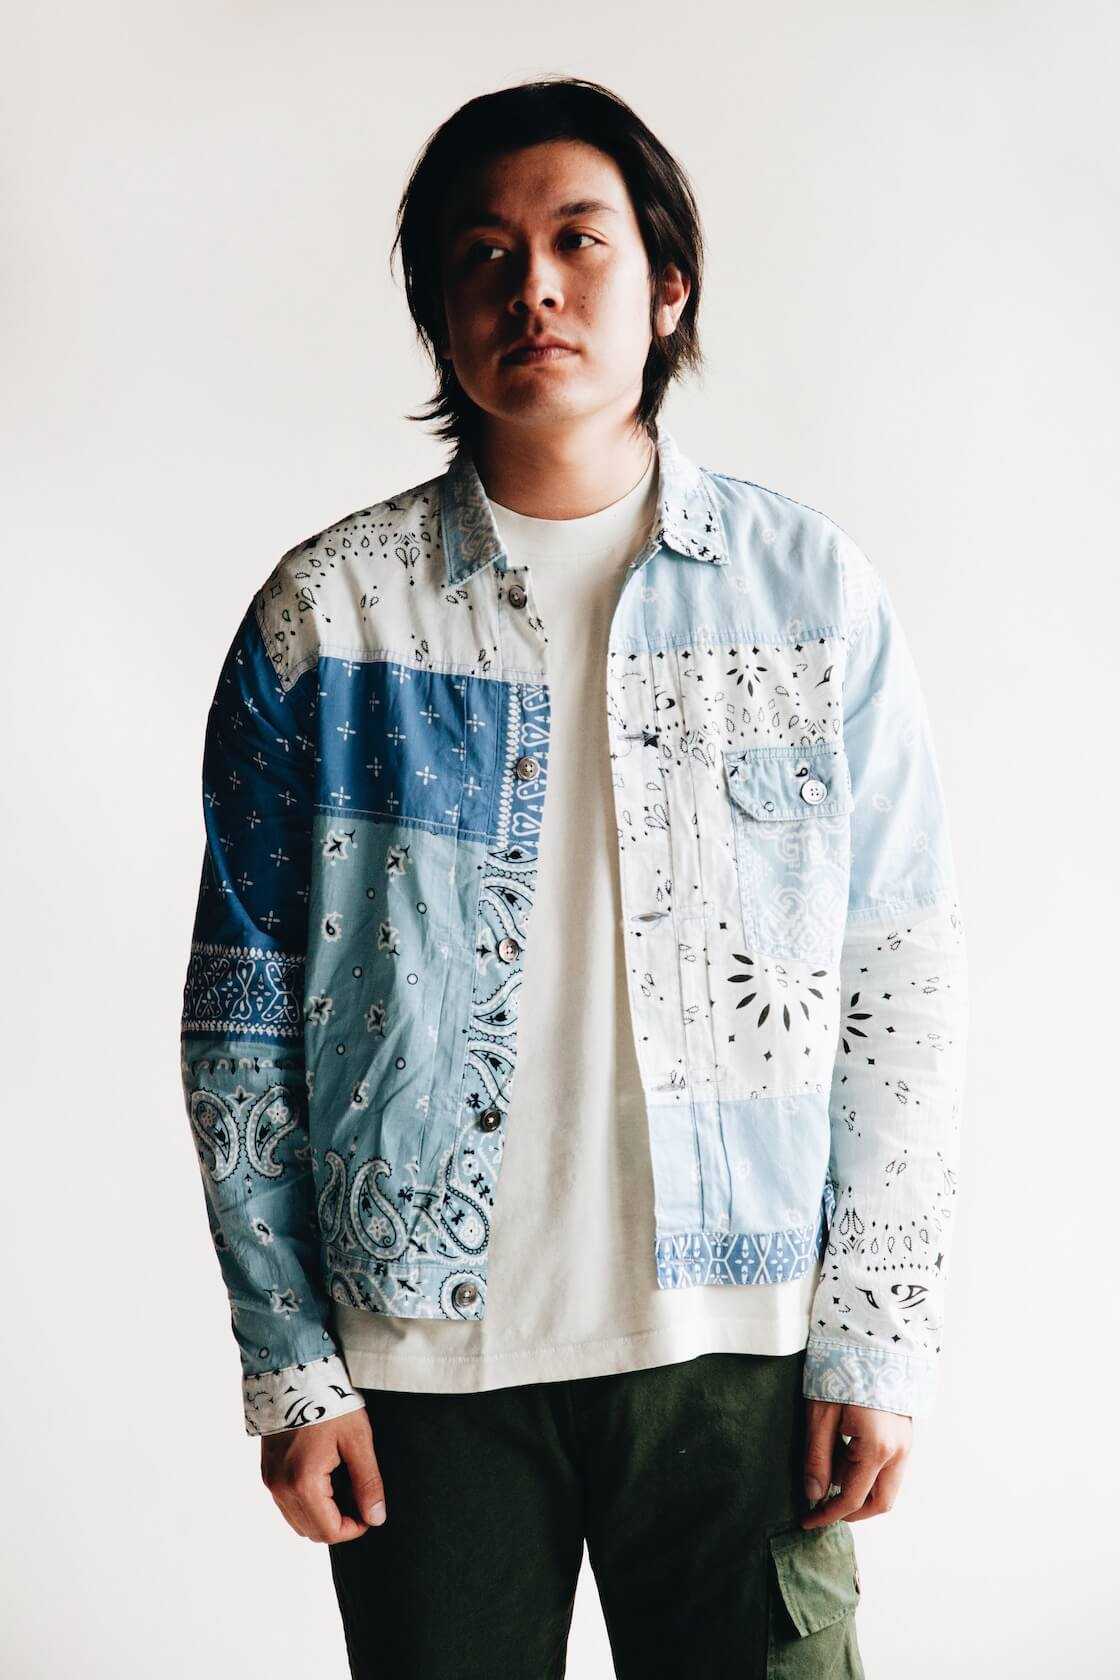 kapital japan's bandana inspired clothing from ss20